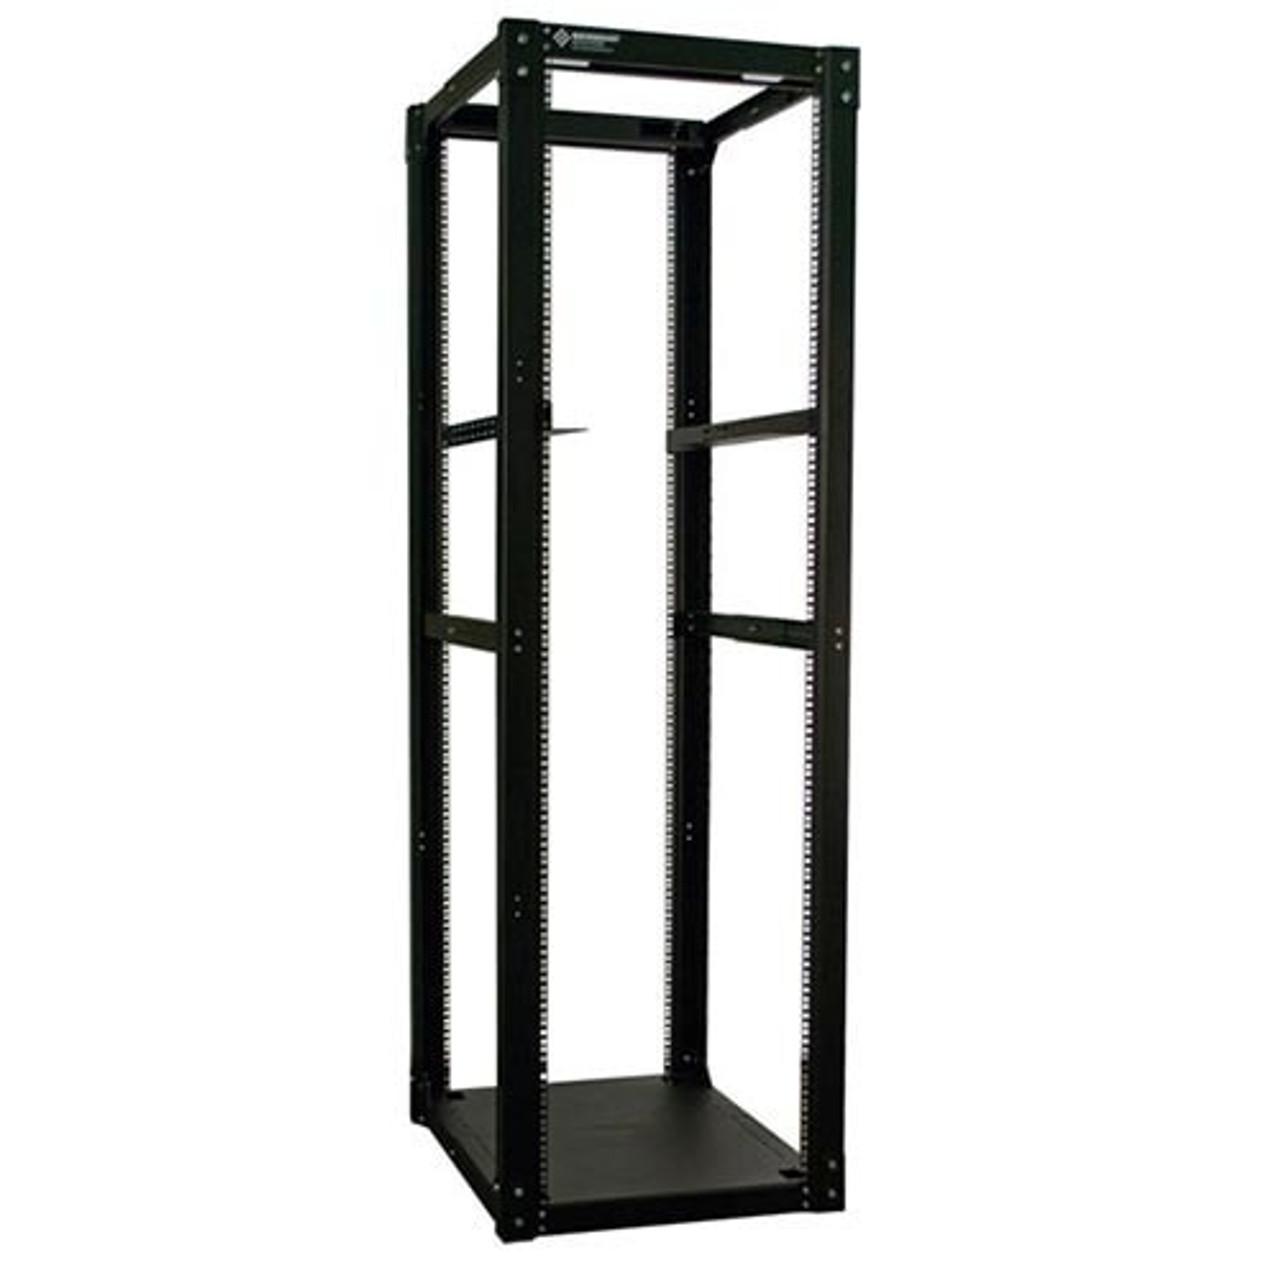 24u 4 Post Server Rack W Angle Brackets